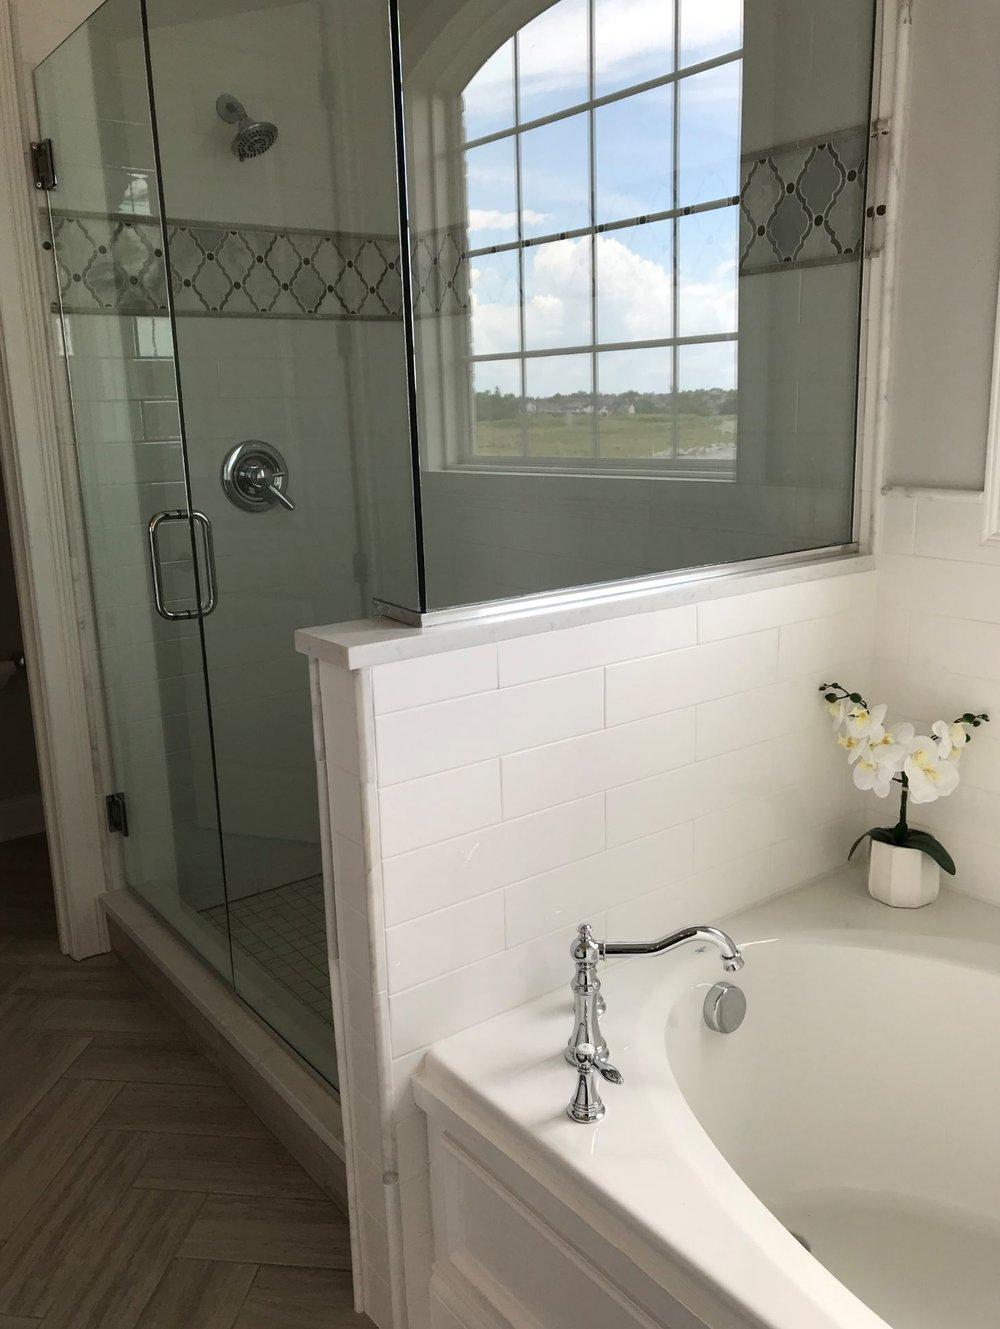 7 bathroom design lexington kentucky.JPG